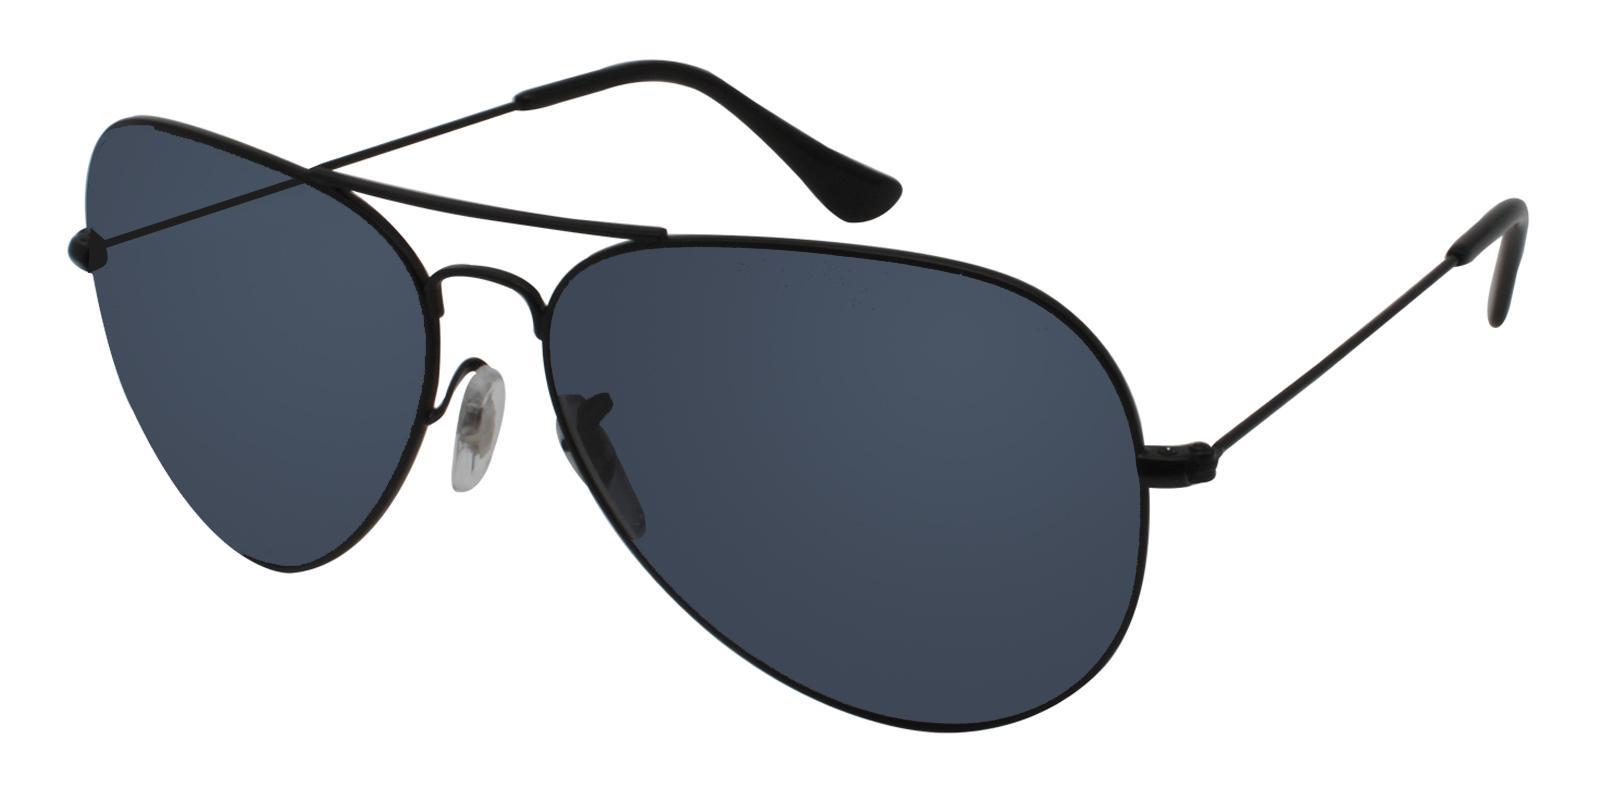 Harbor Black Metal Lightweight , NosePads , Sunglasses Frames from ABBE Glasses